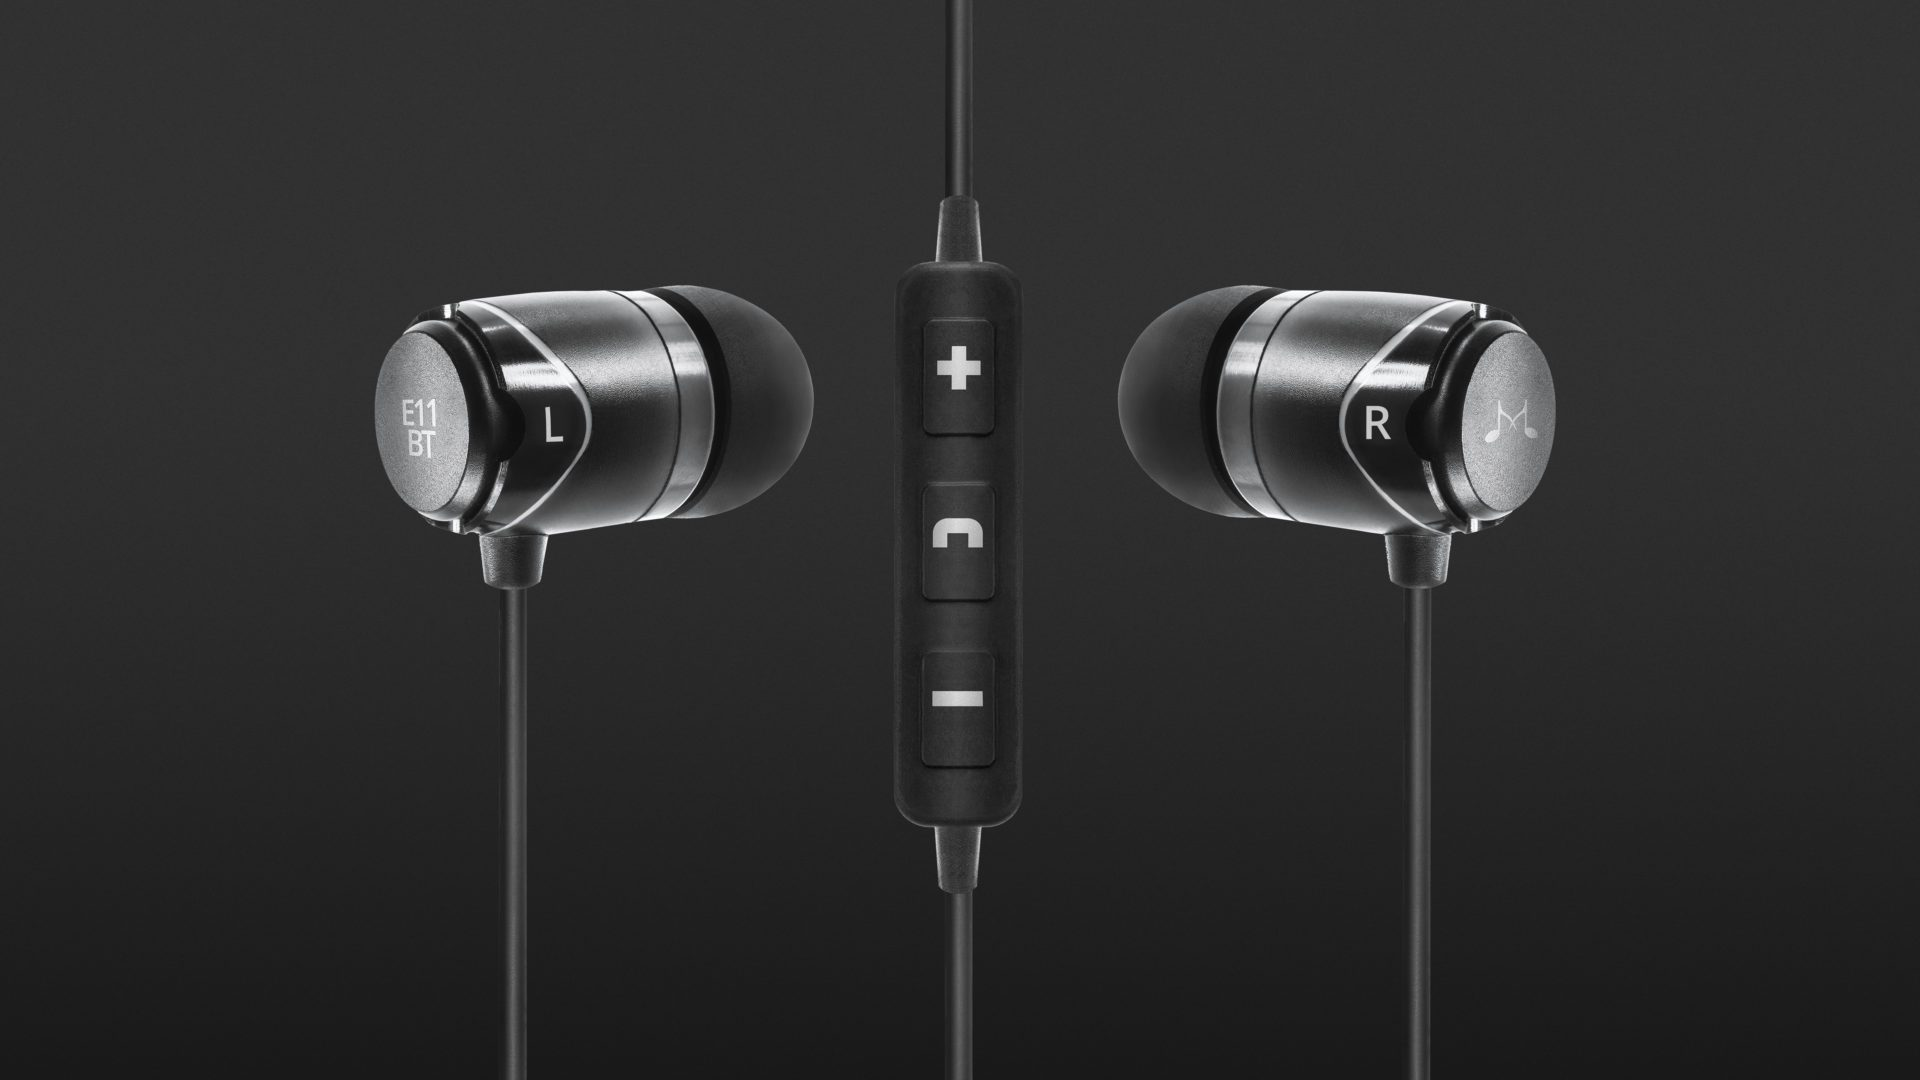 SoundMAGIC E11BT